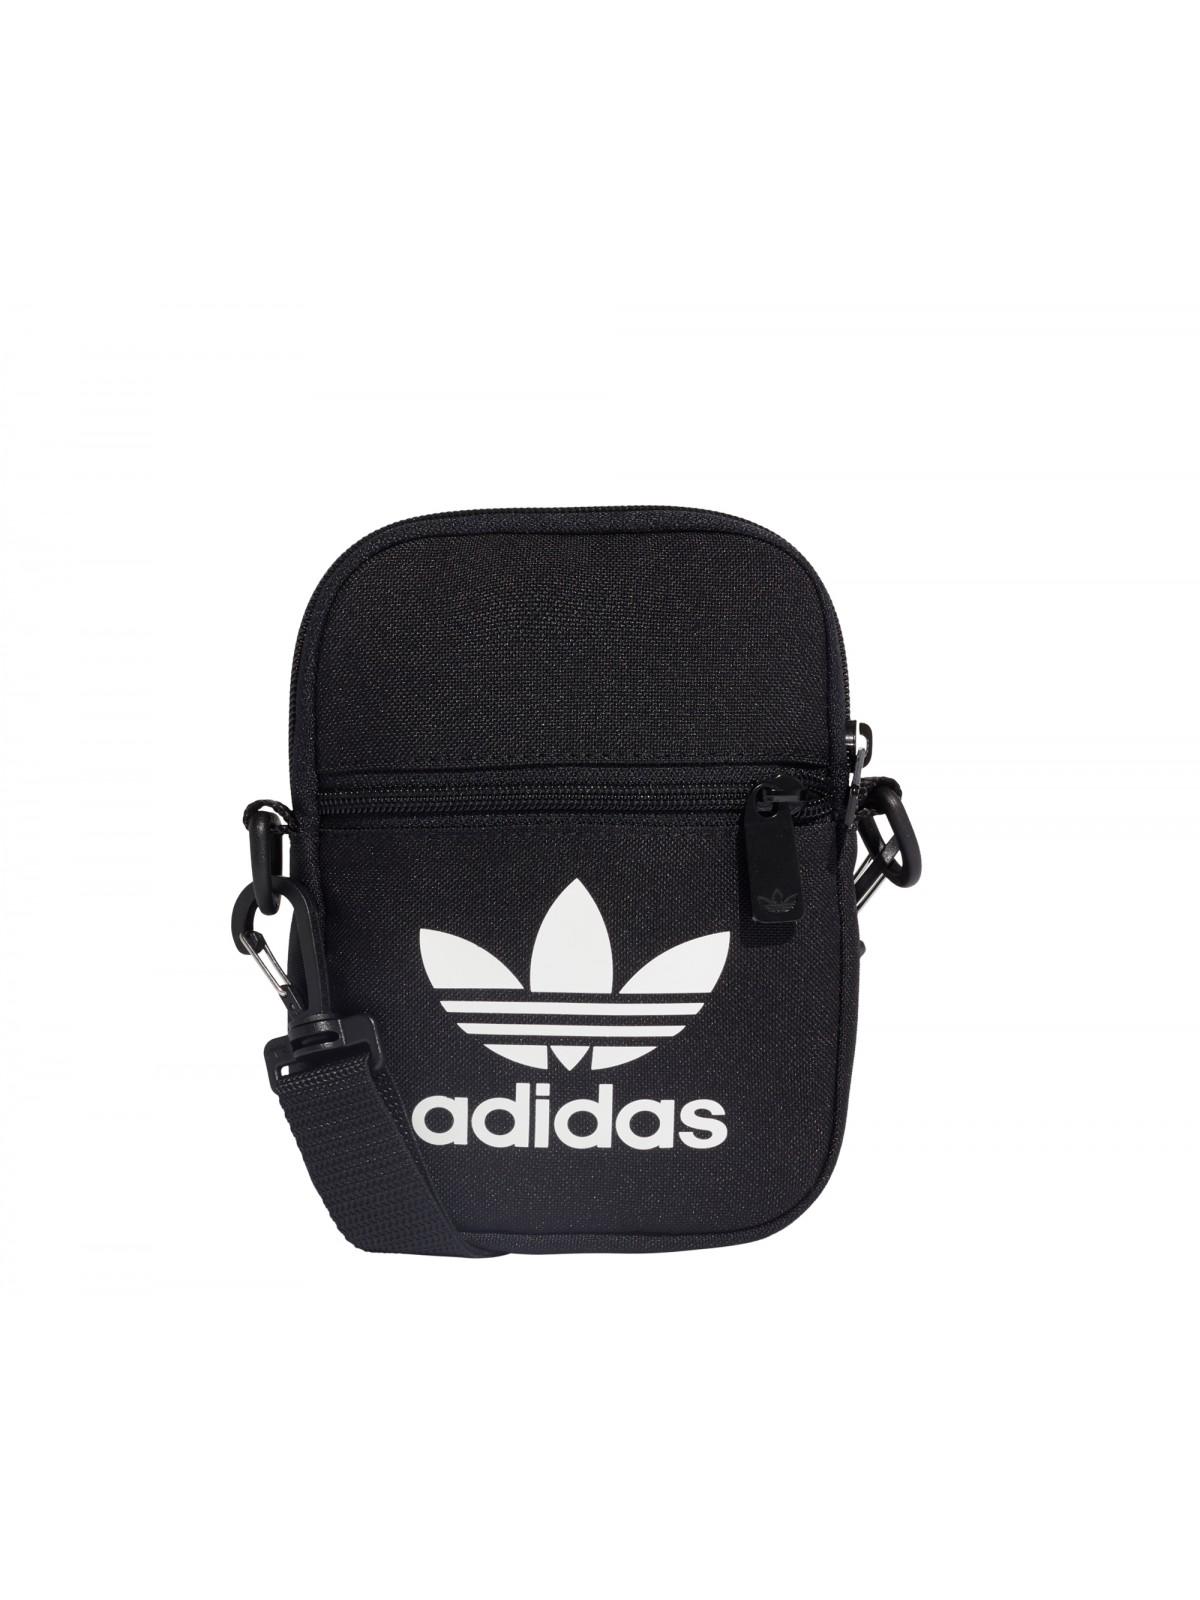 ADIDAS Festbag  noir